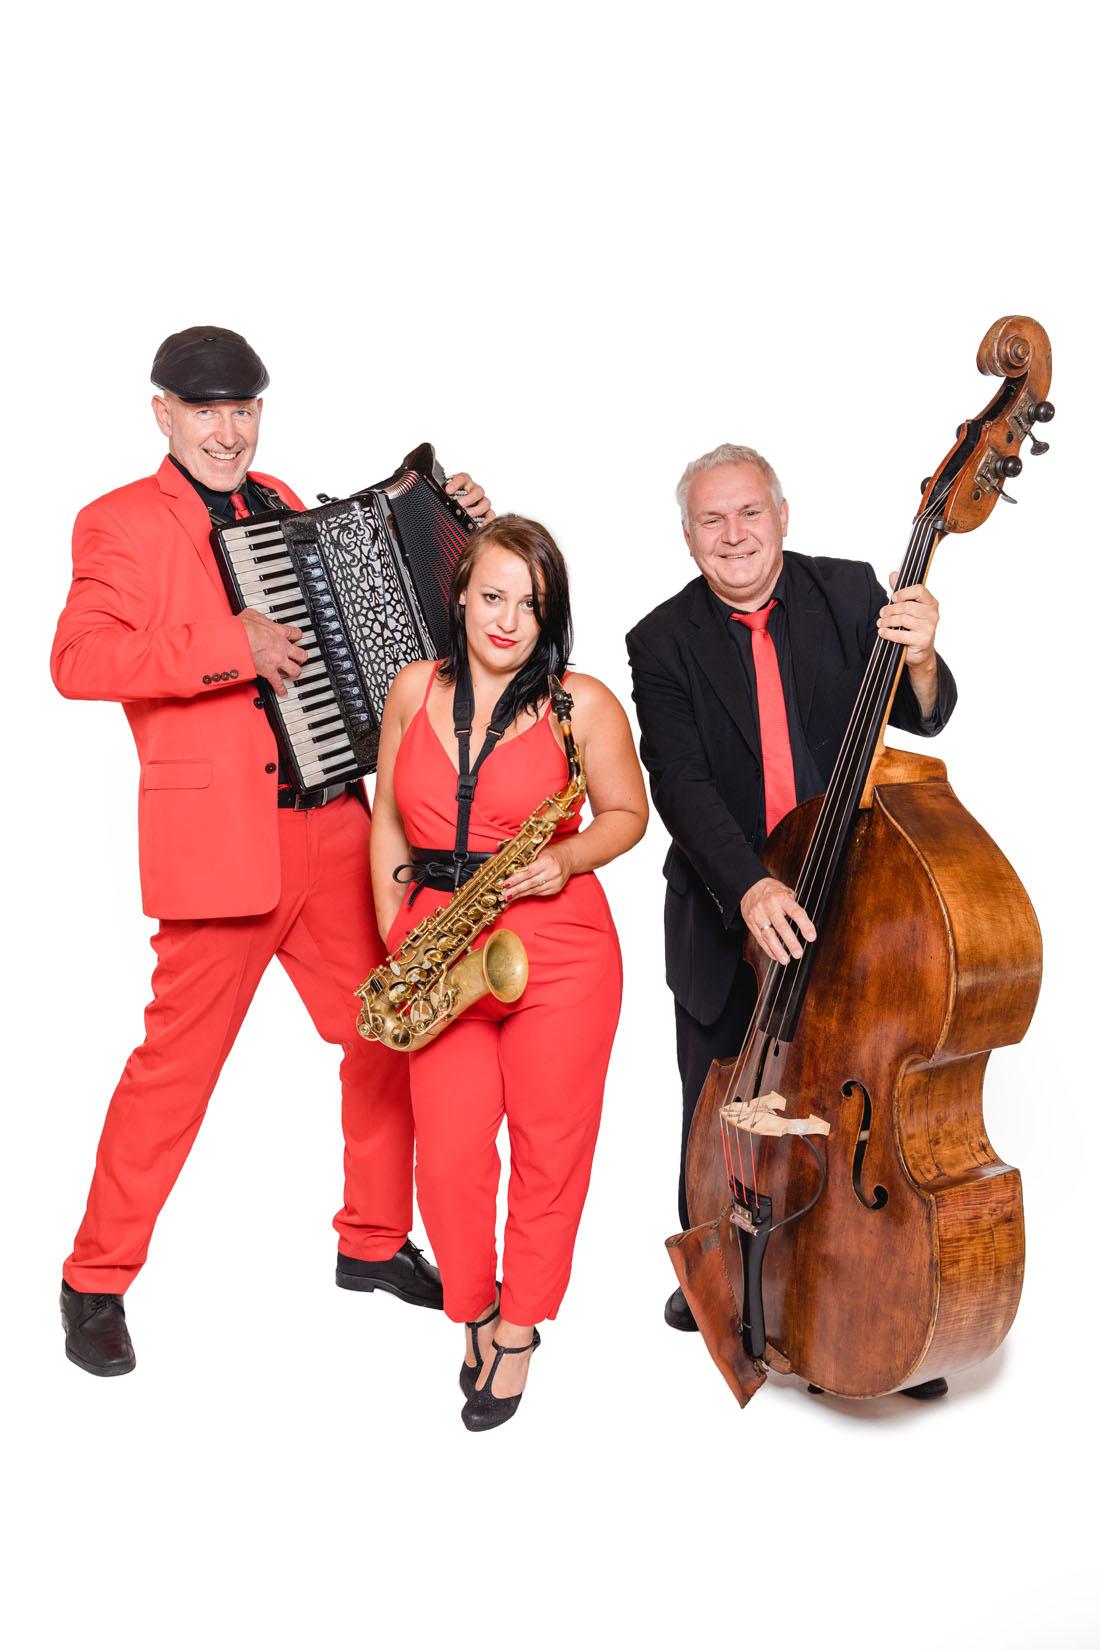 Unplugged-Trio Akkordeon, Saxofon, Kontrabass